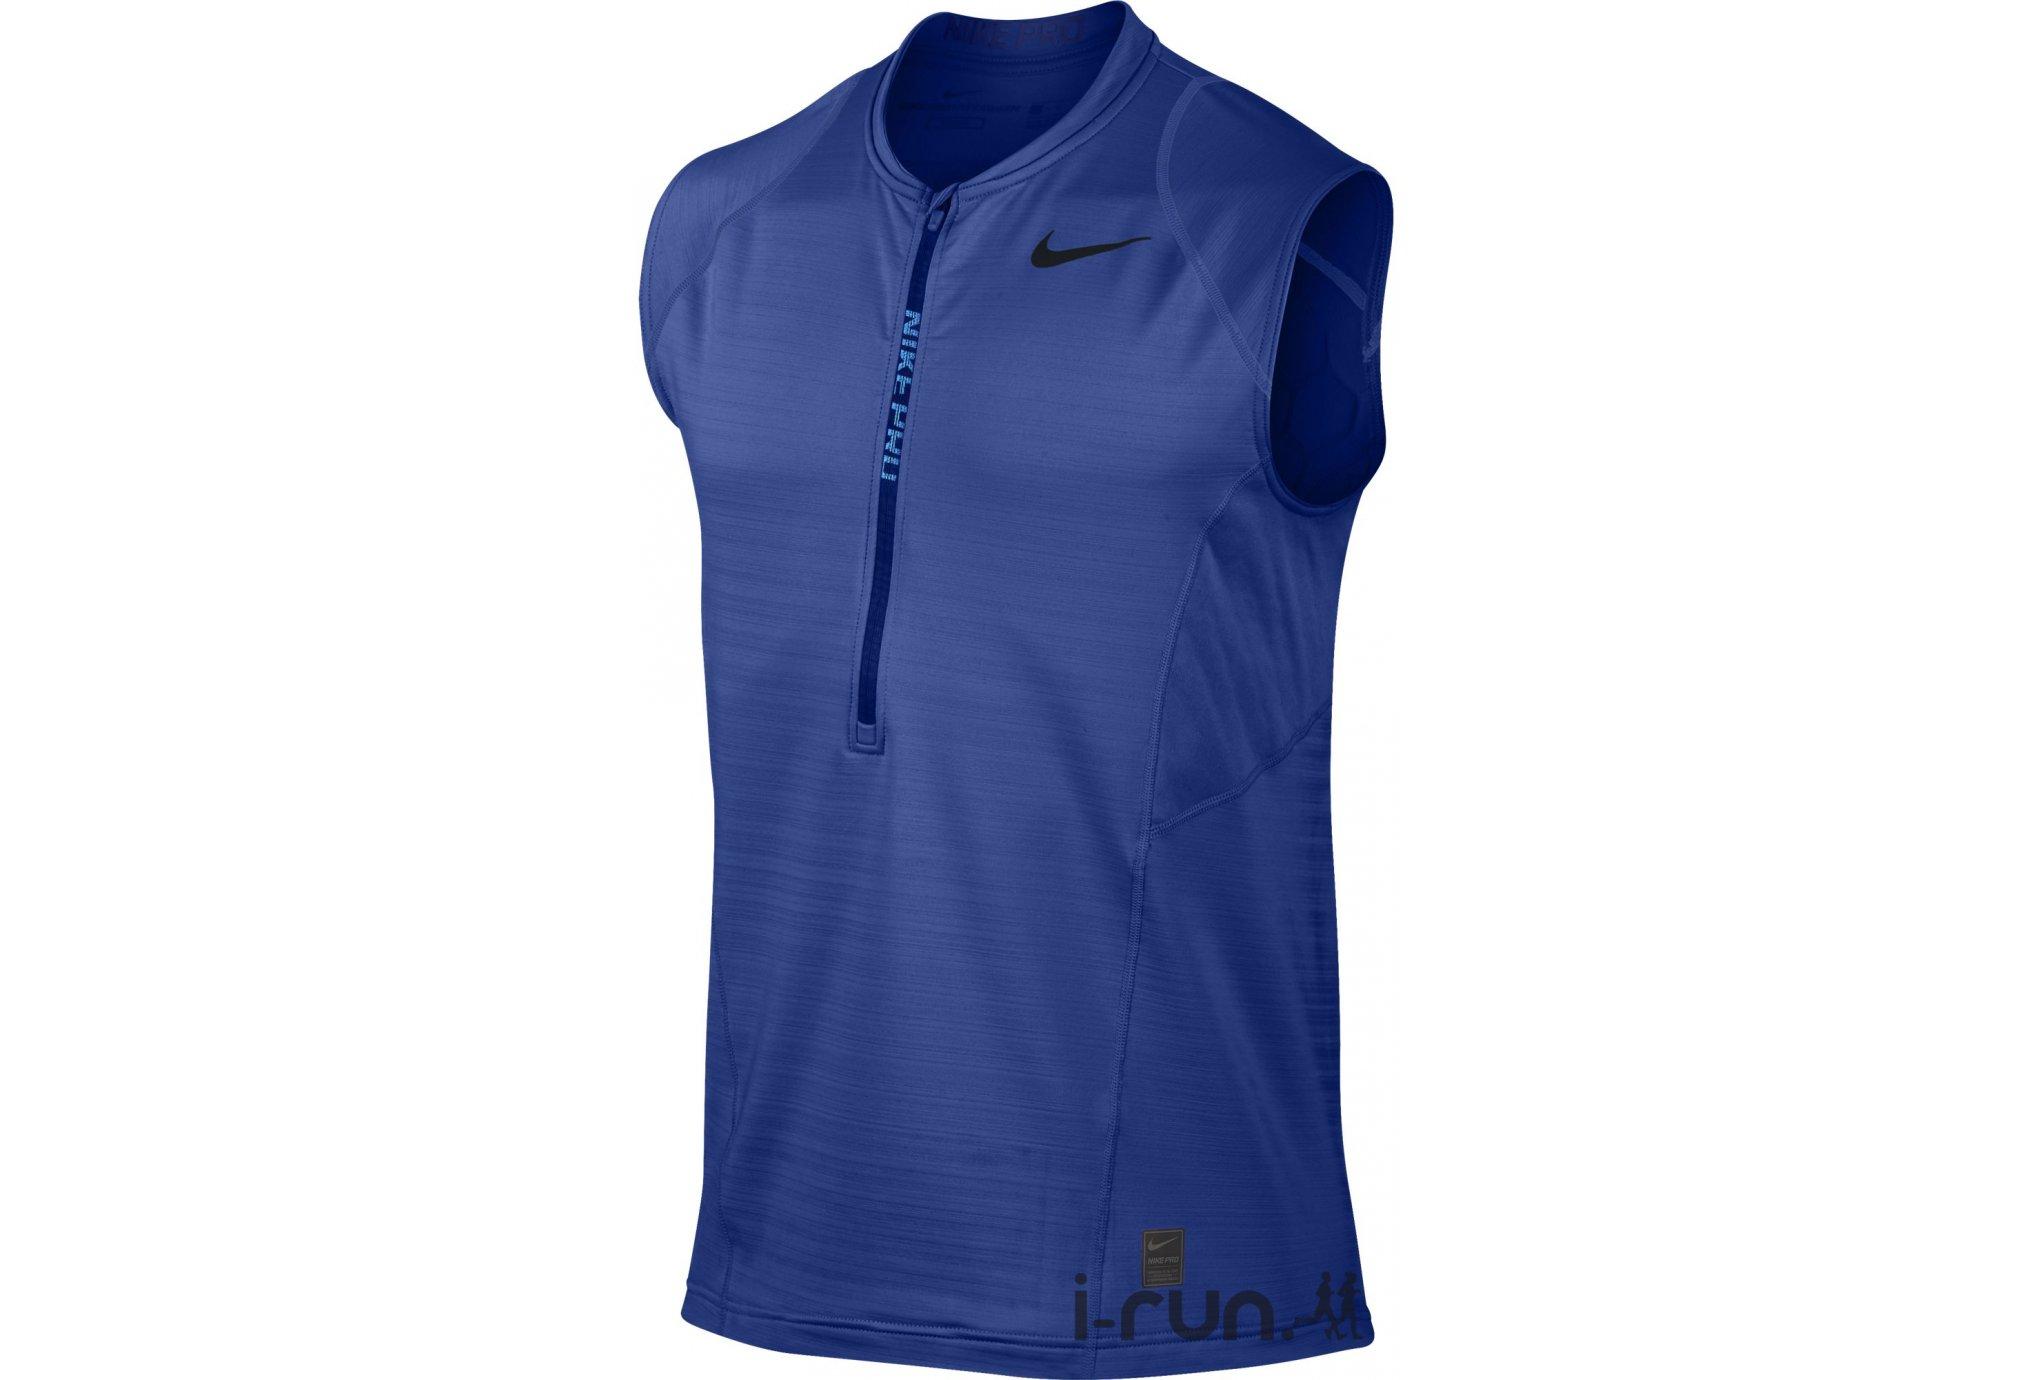 Trail Session - Nike Pro Débardeur Hyperwarm Top M vêtement running ... 8f4bd62c2564